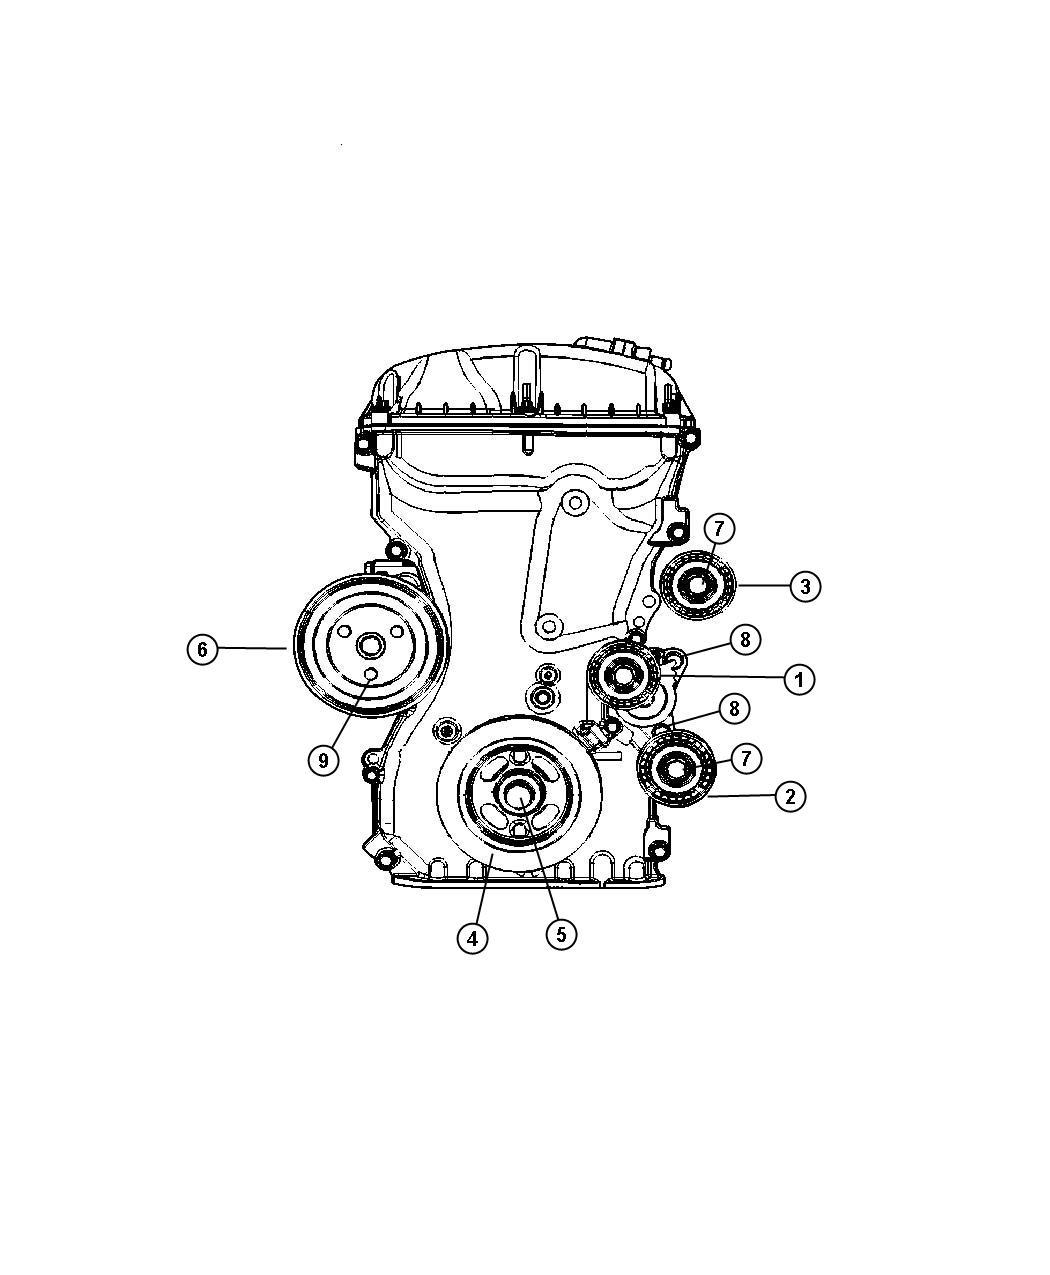 Hqdefault as well Wiring Diagram Dodge Avenger likewise I additionally Maxresdefault additionally E C Fa Ba C Cc E. on 2009 dodge caliber belt diagram